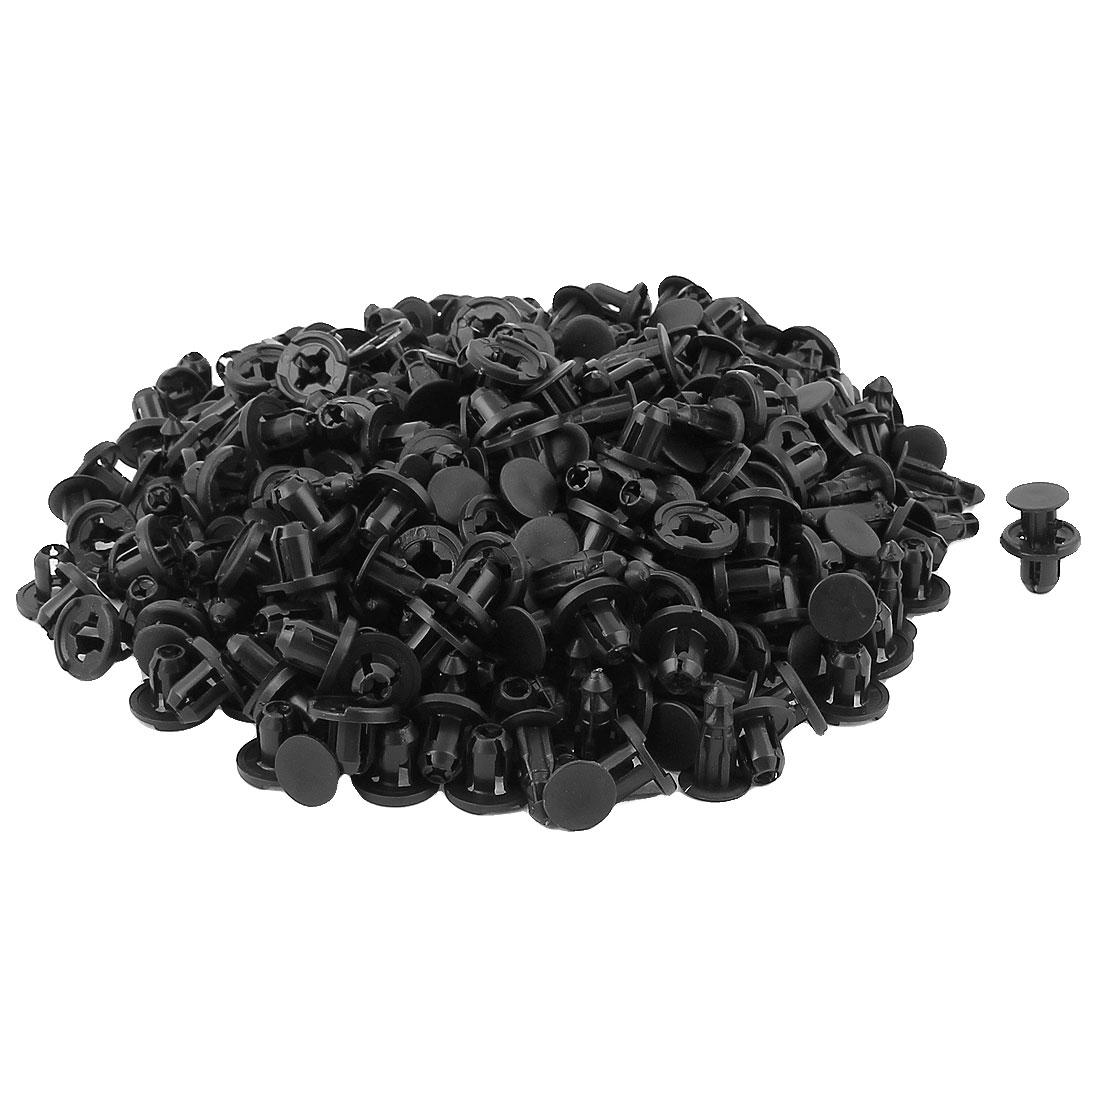 Car Fender 8mm Dia Hole Push in Type Black Plastic Clips Rivets Fastener 200Pcs